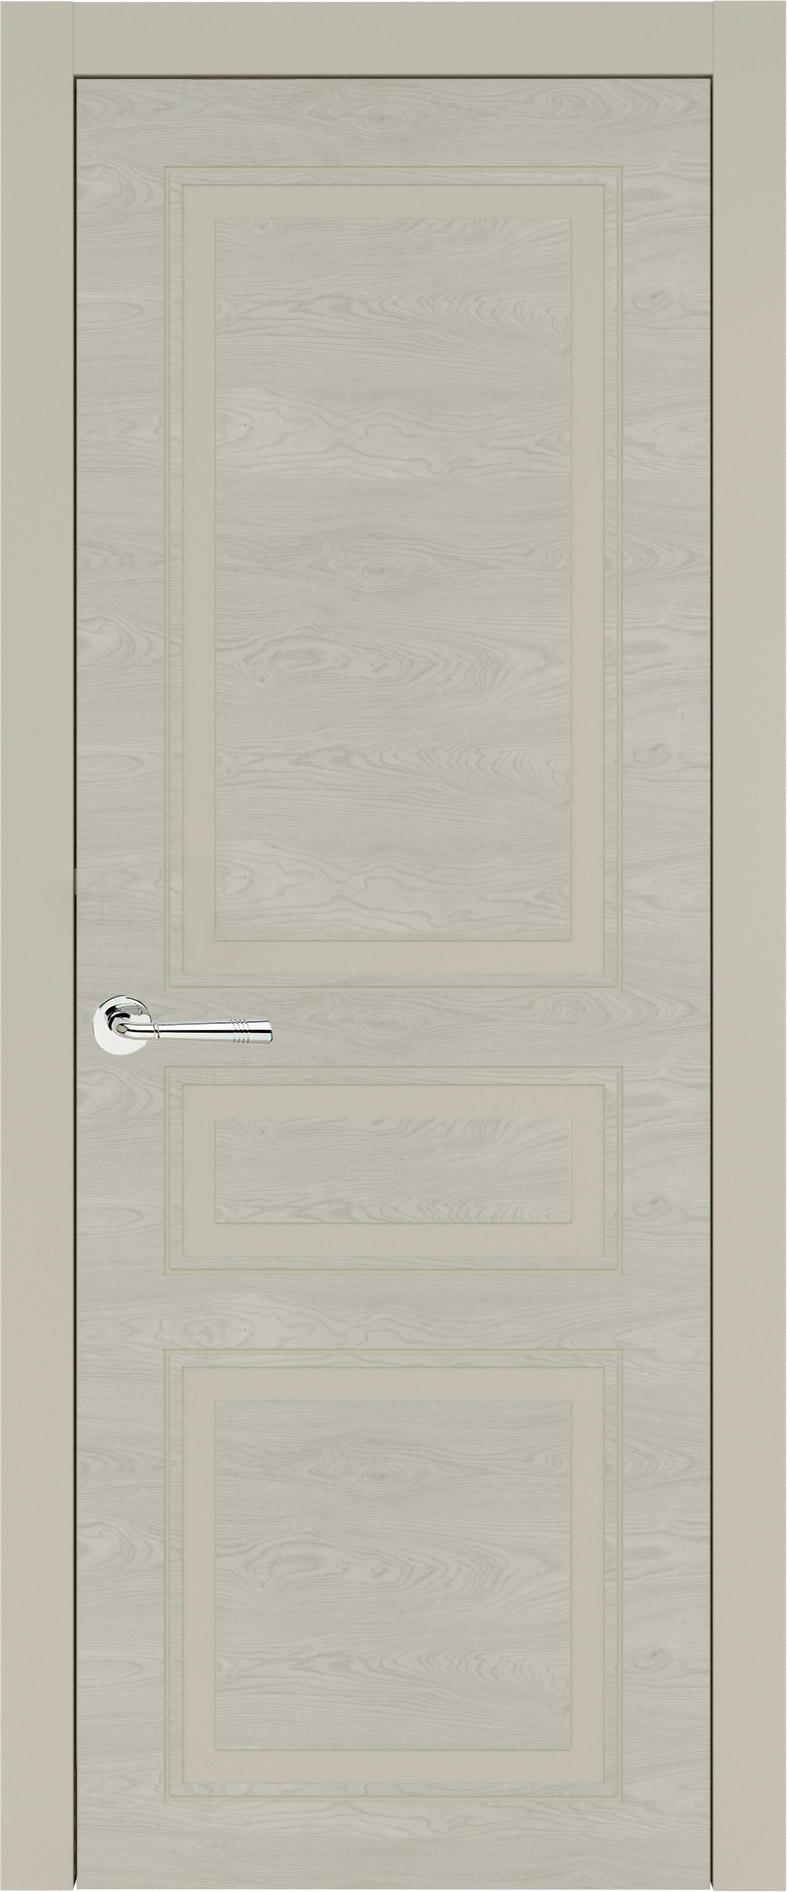 Imperia-R Neo Classic цвет - Серо-оливковая эмаль по шпону (RAL 7032) Без стекла (ДГ)